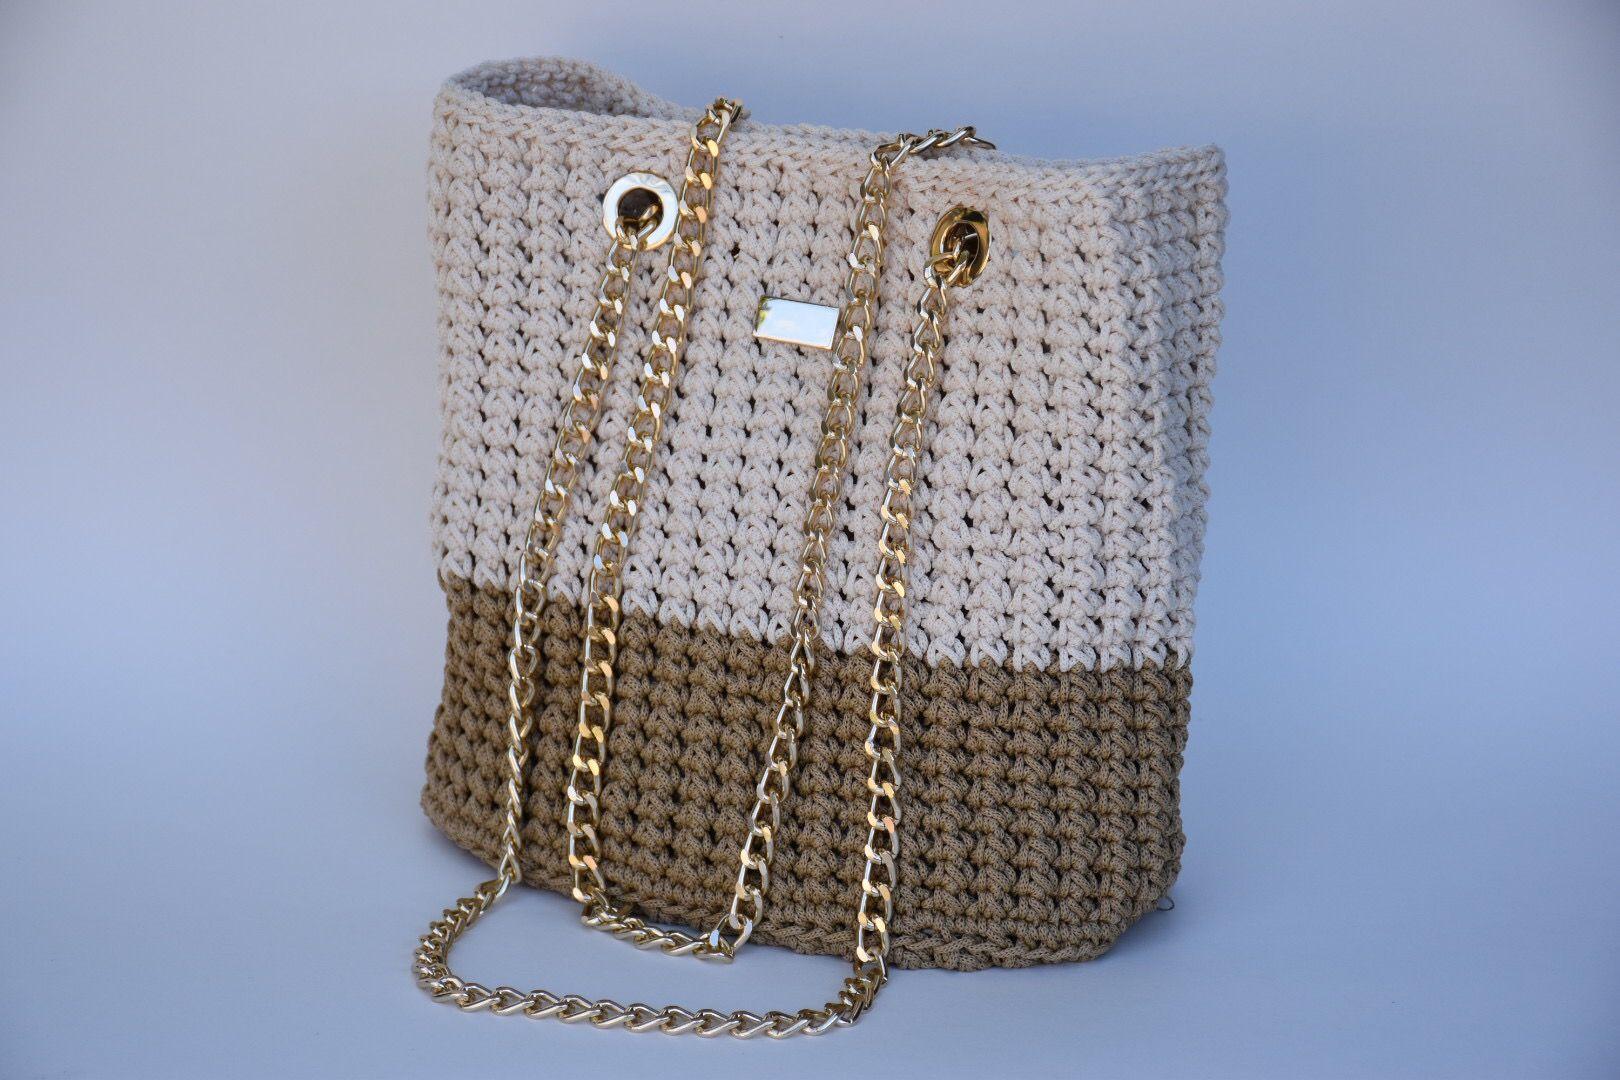 Spring vibes #bag #crochetbag #handmadebag #madeingreece #handmadebyfei #χειροποιητεςτσαντες #custommade #fashion #fashionbloger